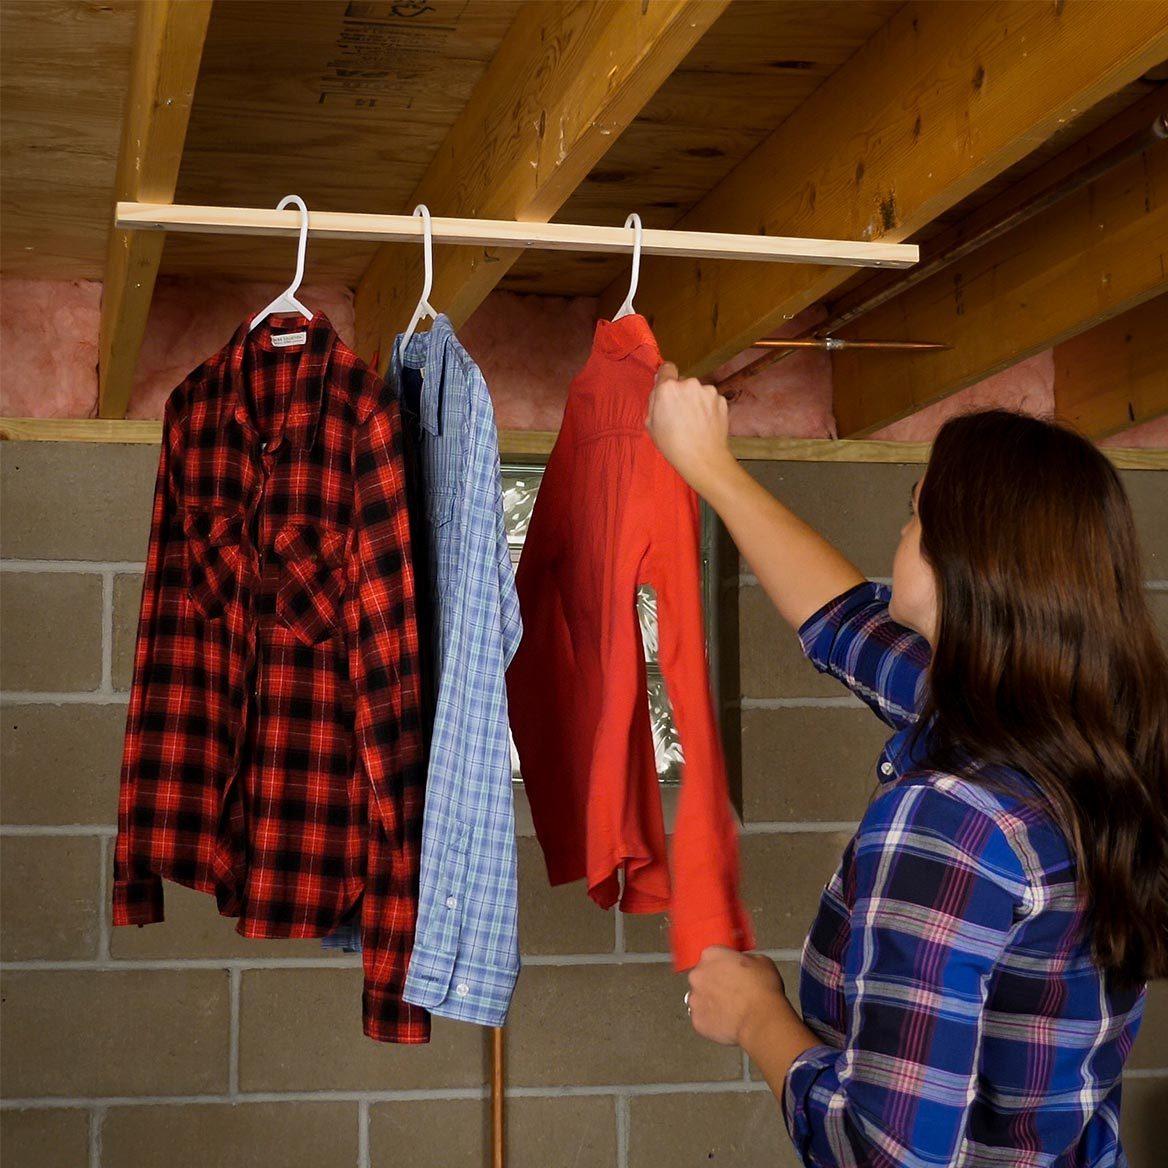 laundry room organizing ideas Hanging Drying Rack